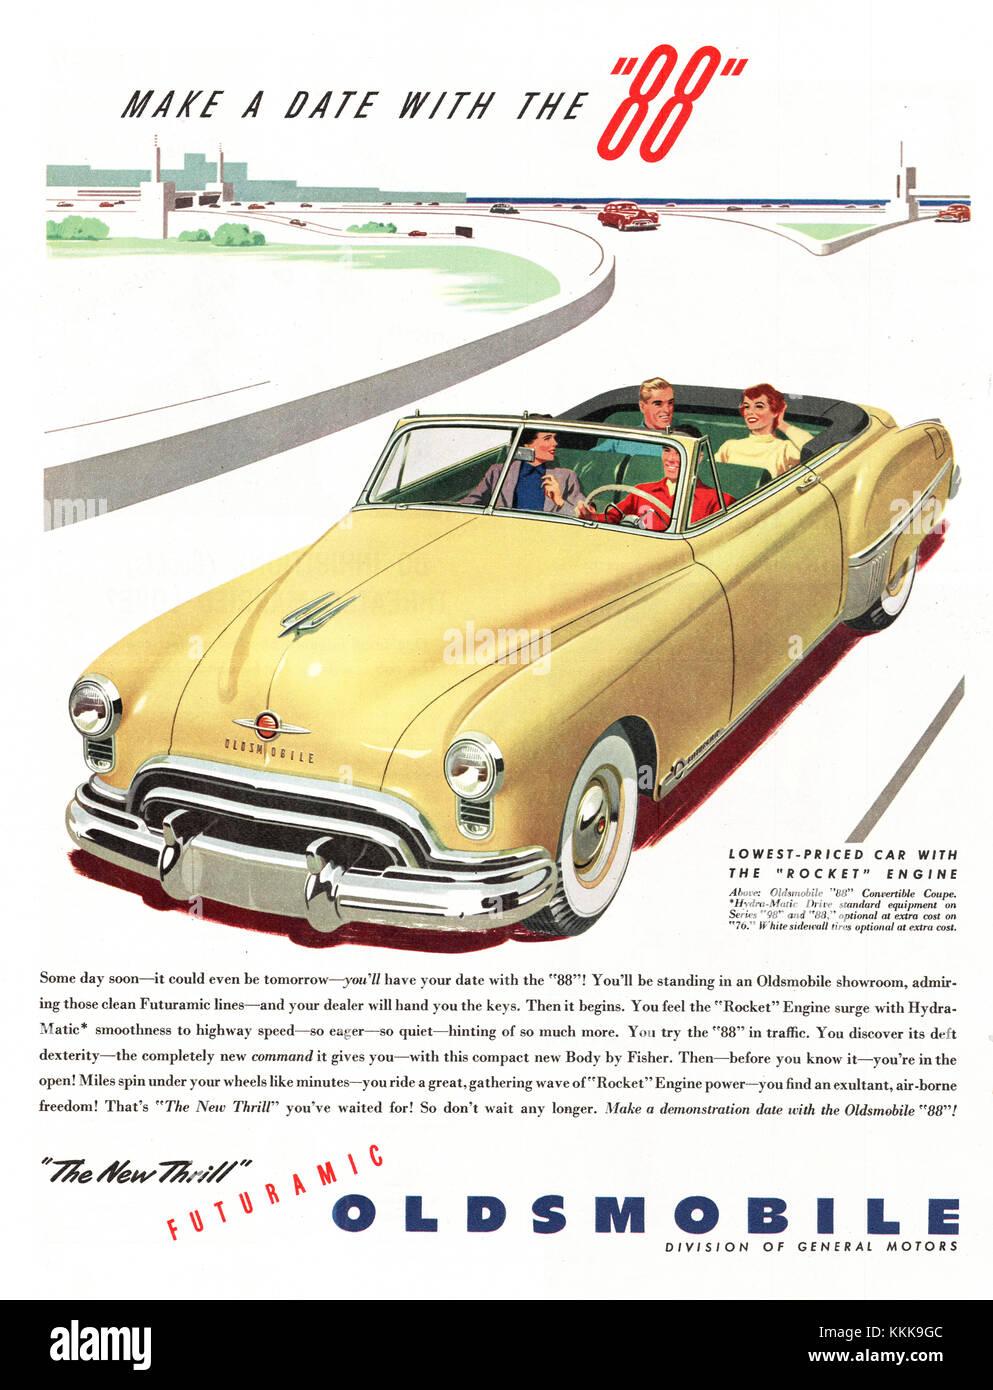 1949 U.S. Magazine Oldsmobile Car Advery Stock Photo, Royalty Free ...